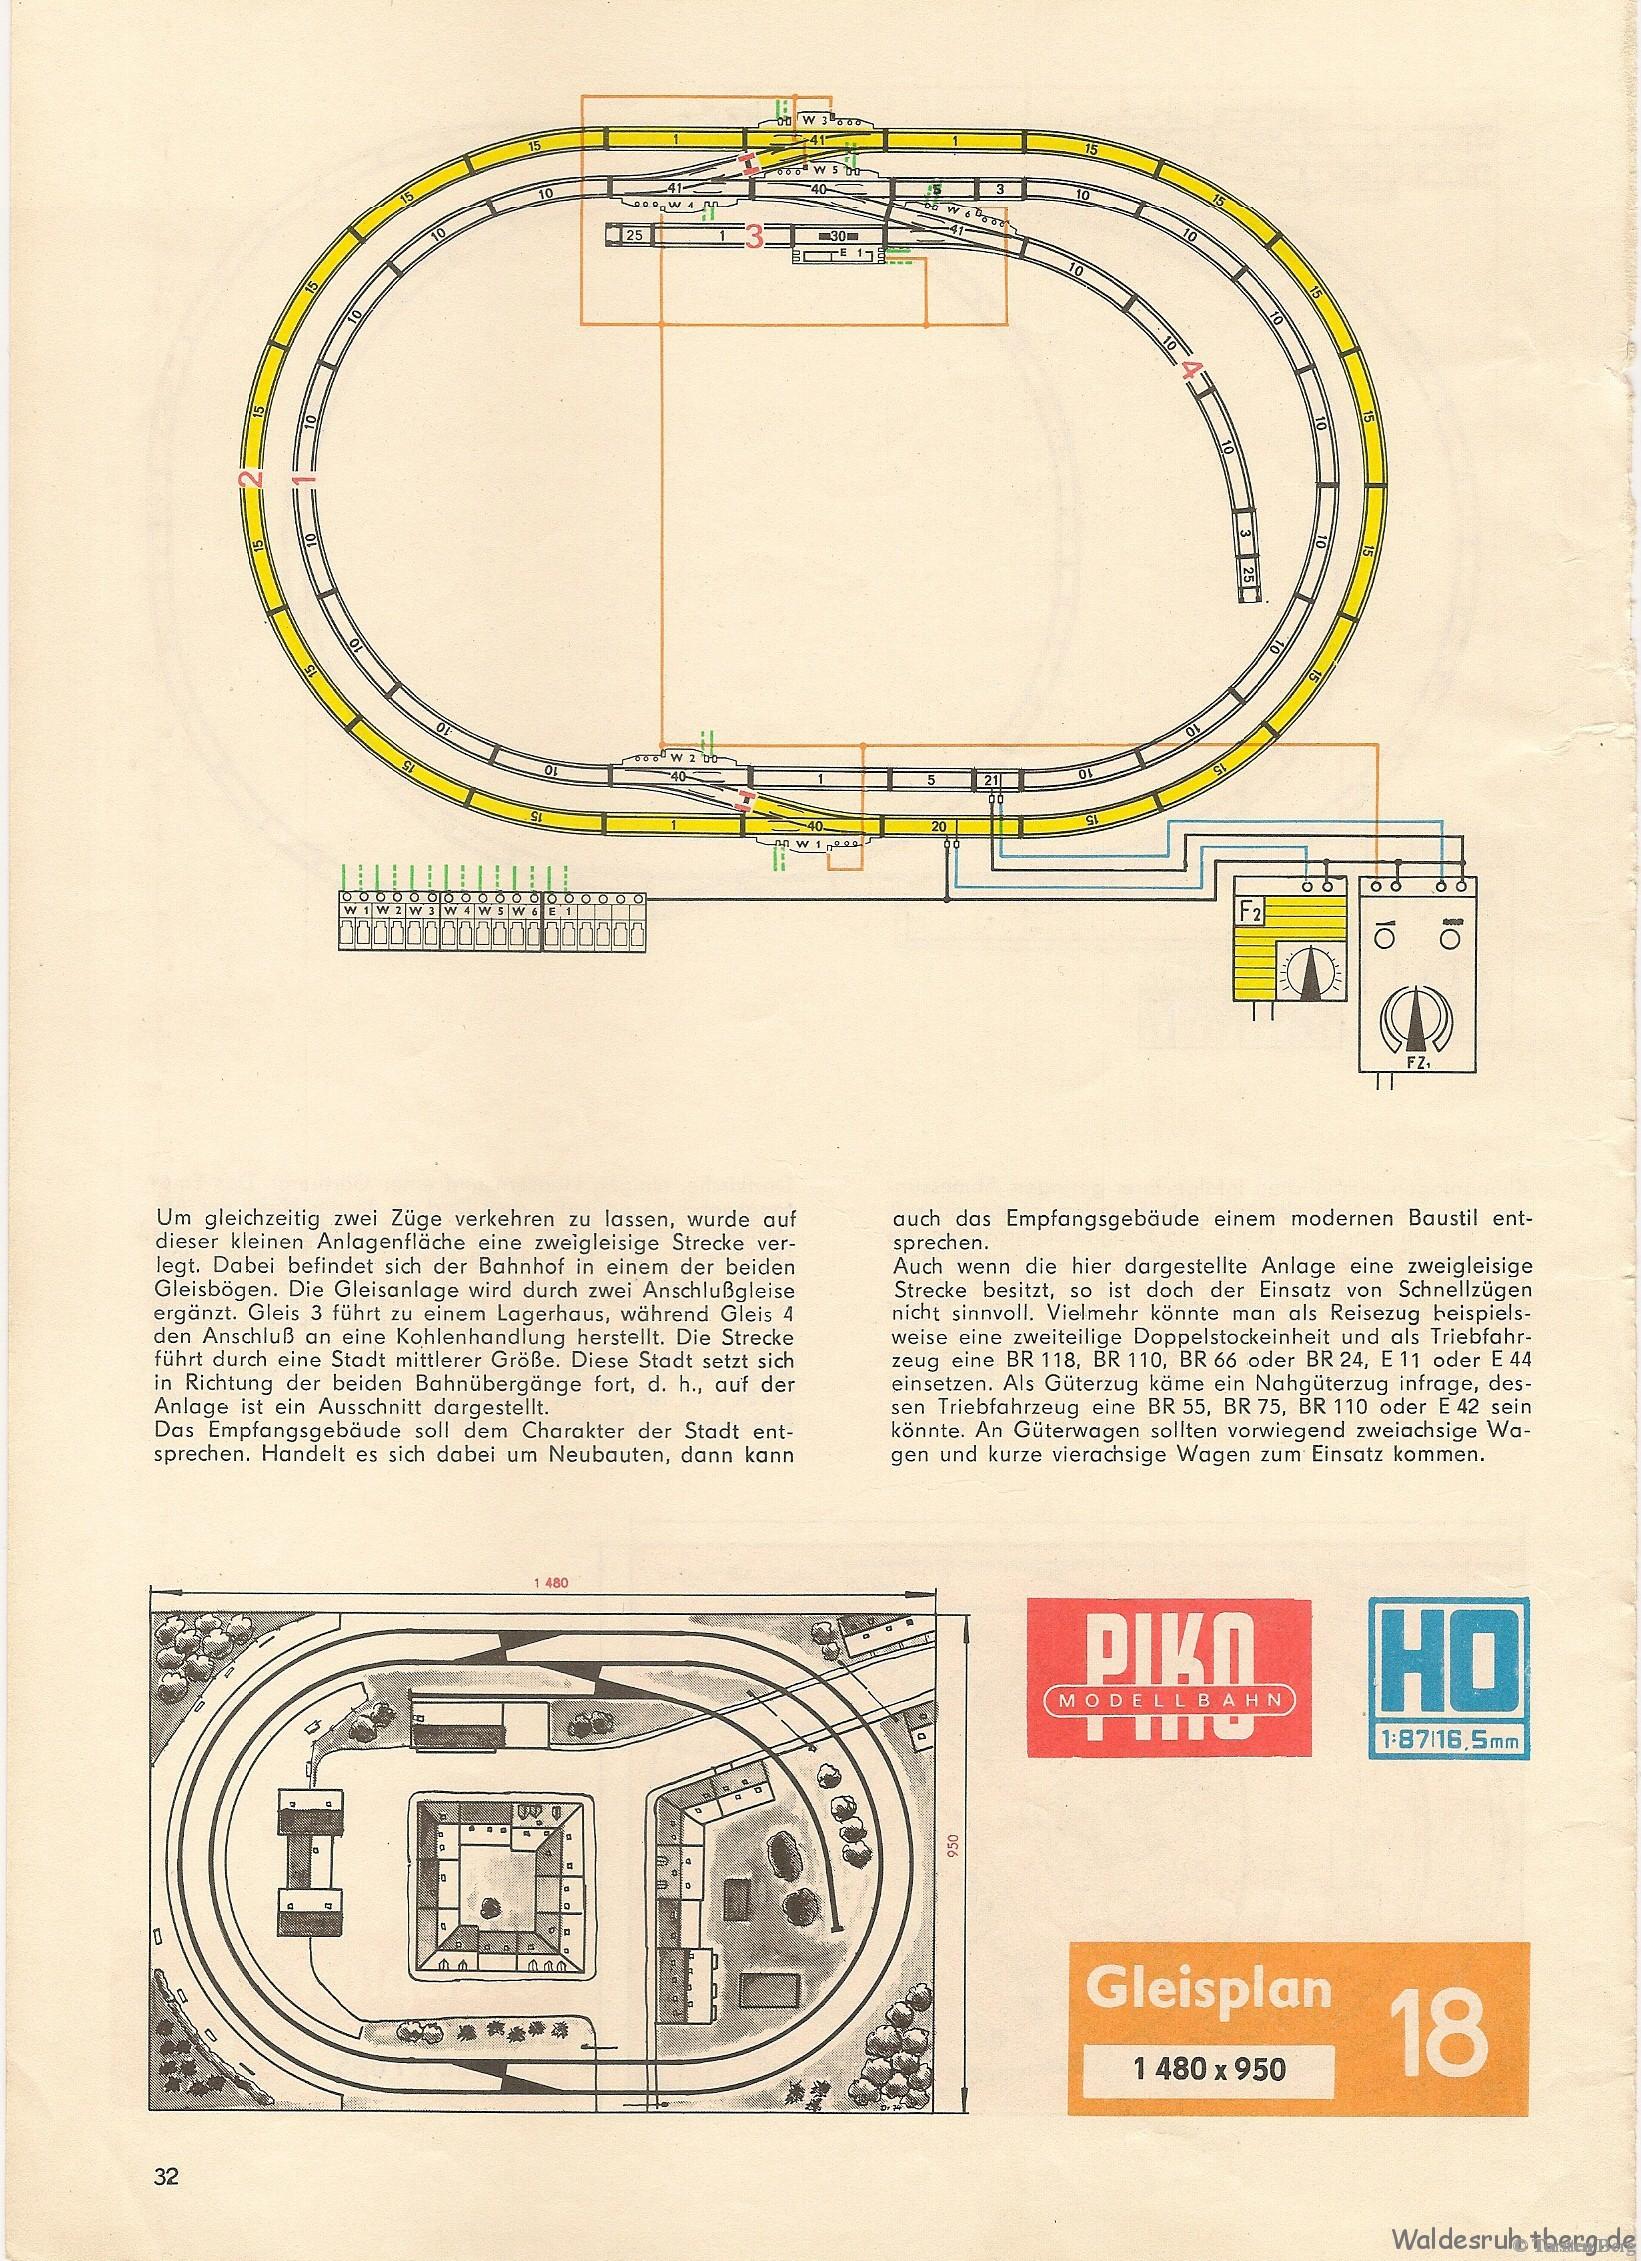 33 PIKO Standardgleis-Gleisplan 18